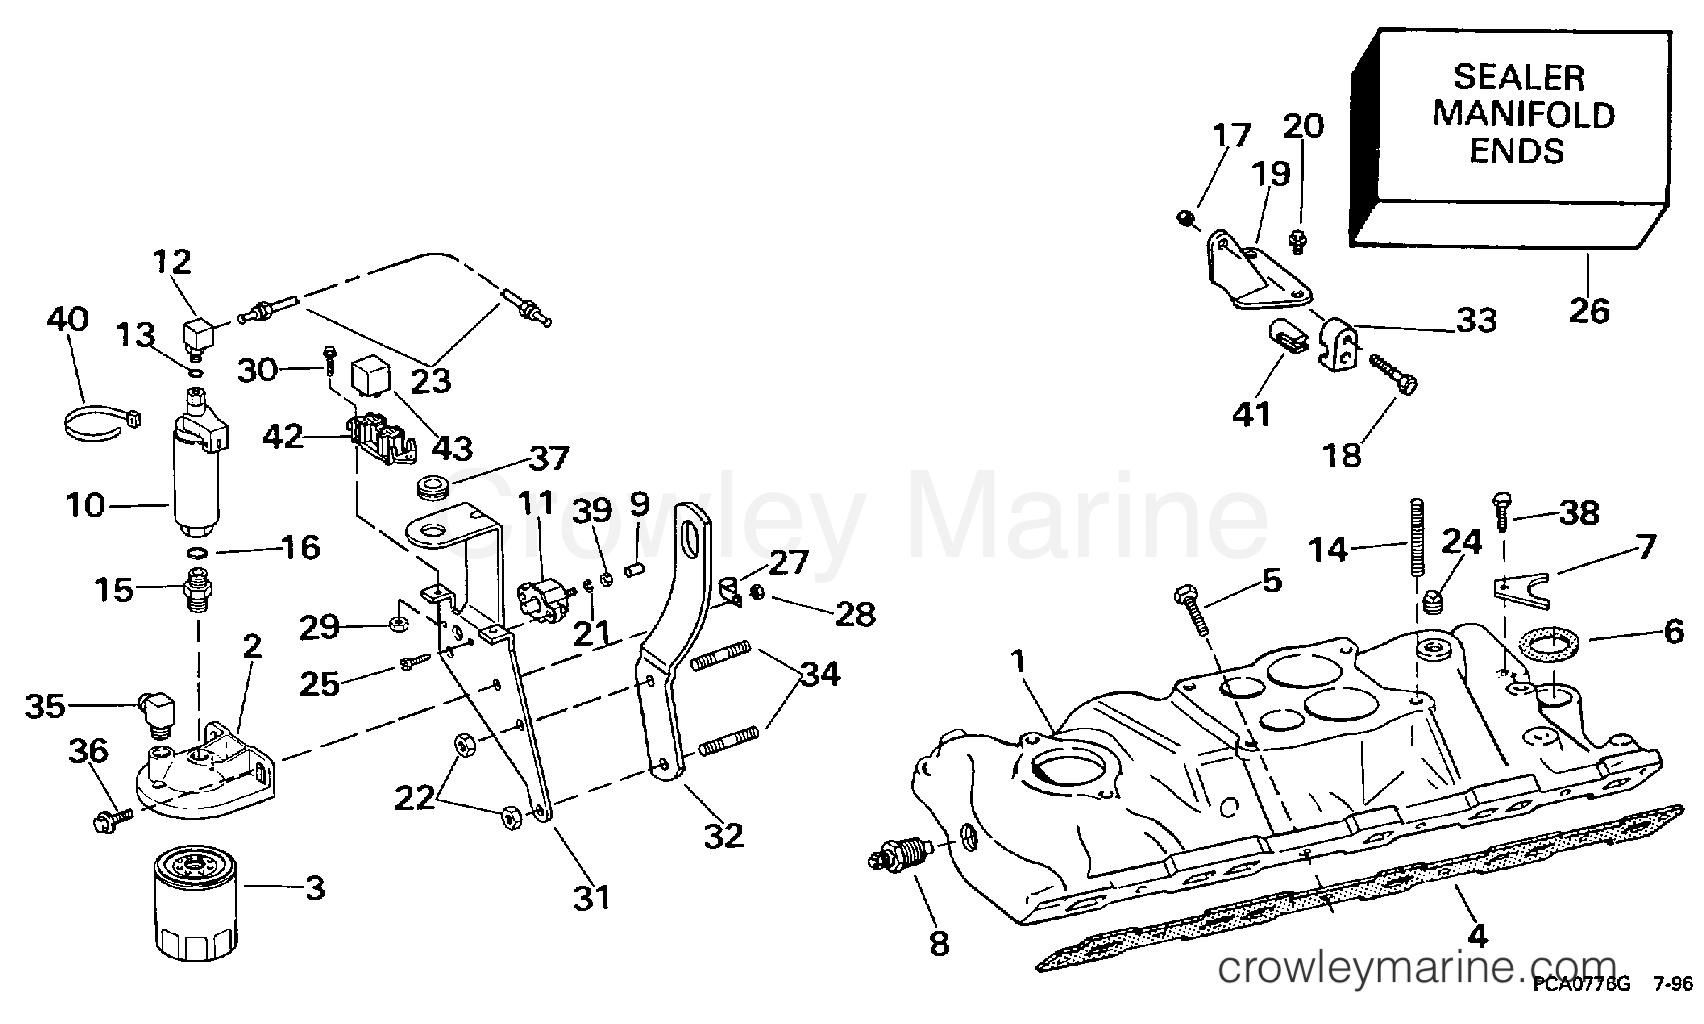 1997 OMC Stern Drive 7.4 - 744FPLKD INTAKE MANIFOLD & FUEL PUMP - 4V MODELS section